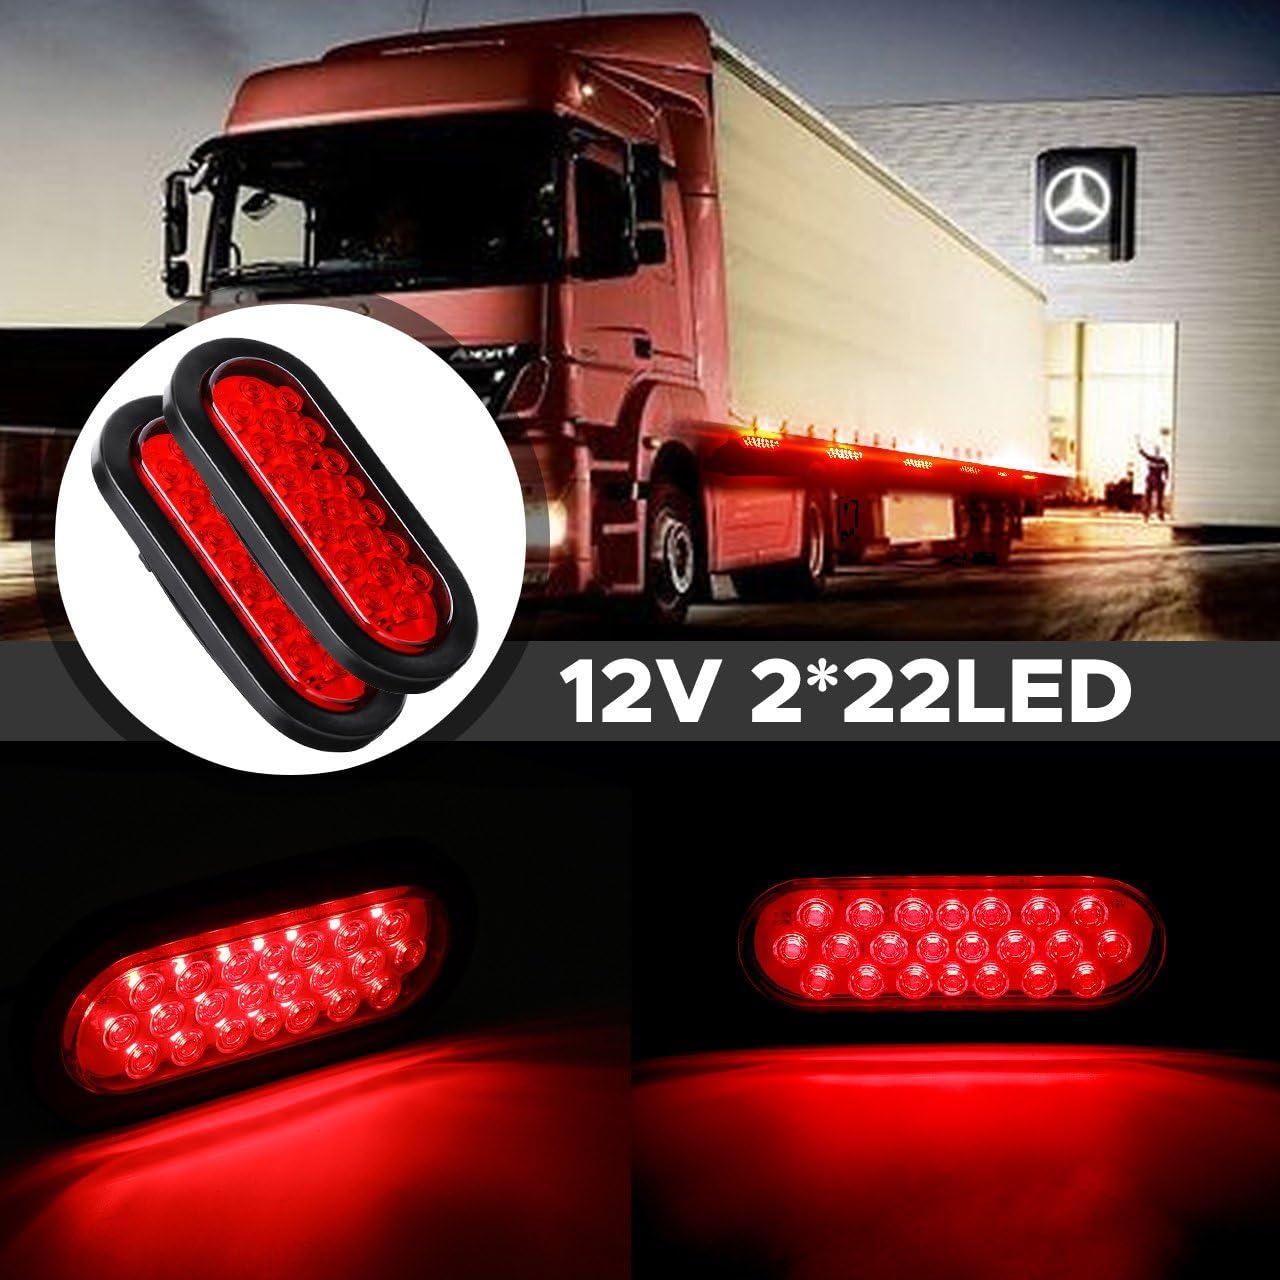 Audew Universal Tail Lights Reversing Lights Turn Signal Tail Lights Reversing Lights Tail Lights Set Wired for Truck Trailer Camper Van Truck Tractor 22 2LED